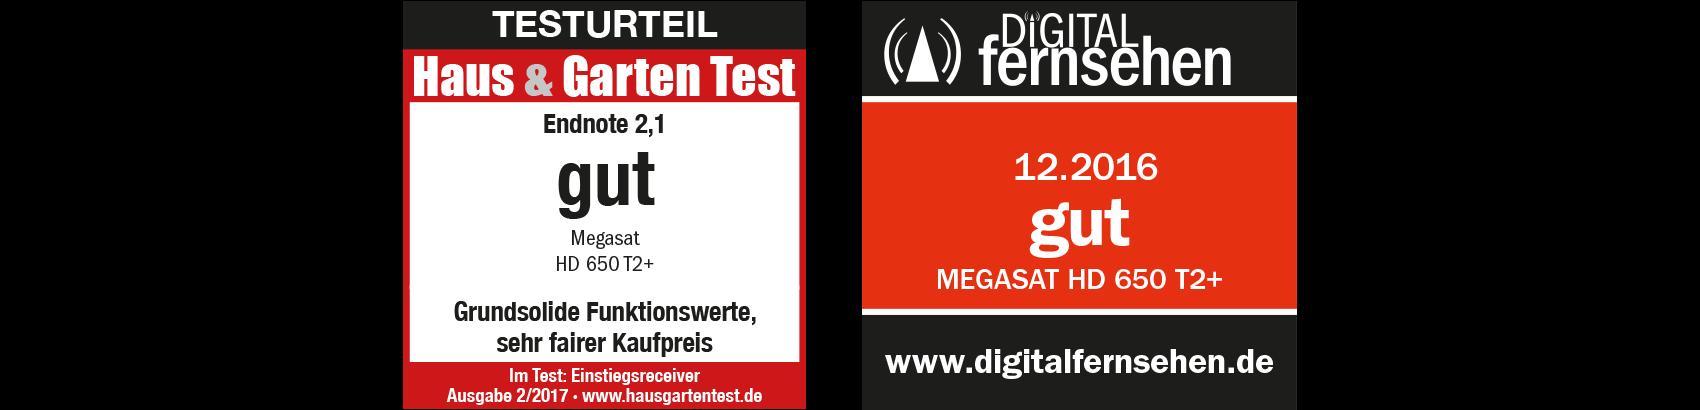 HD 650 T2+ - Megasat